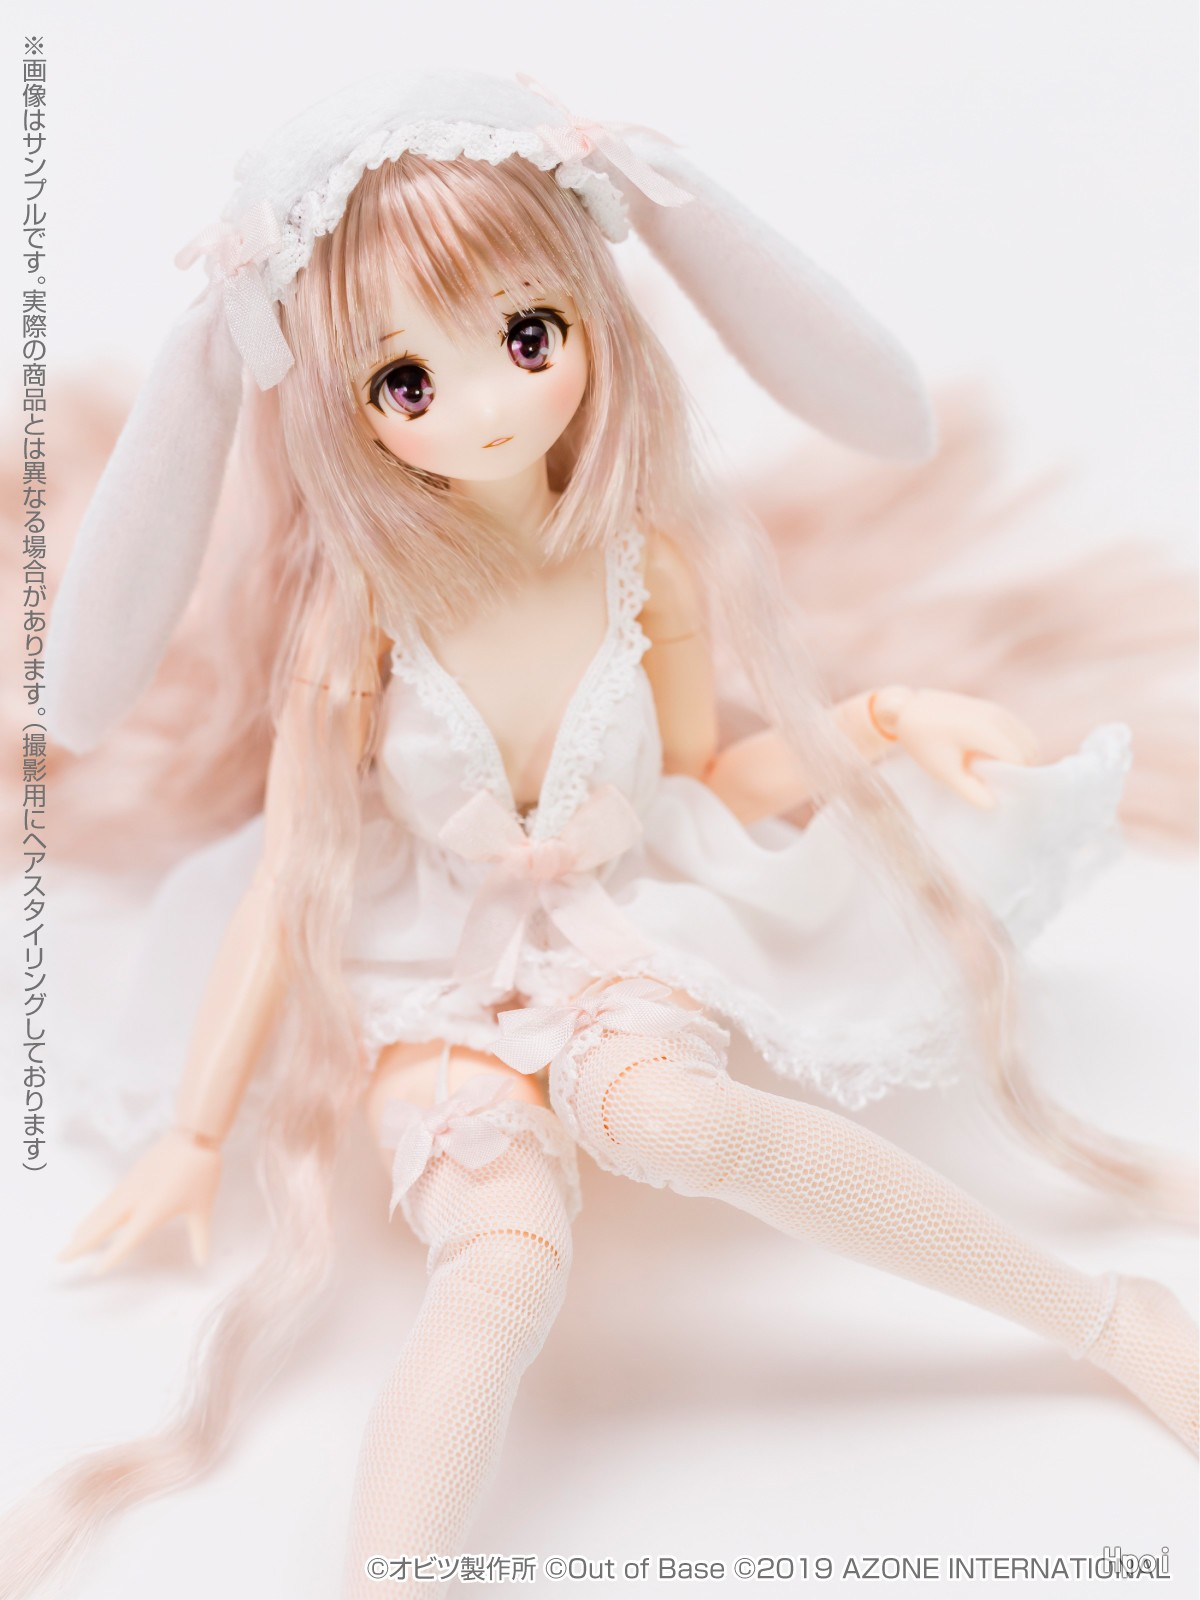 Minami Marshmallow Rabbit Azone Direct Store Sales ver-Garage Kit Dolls